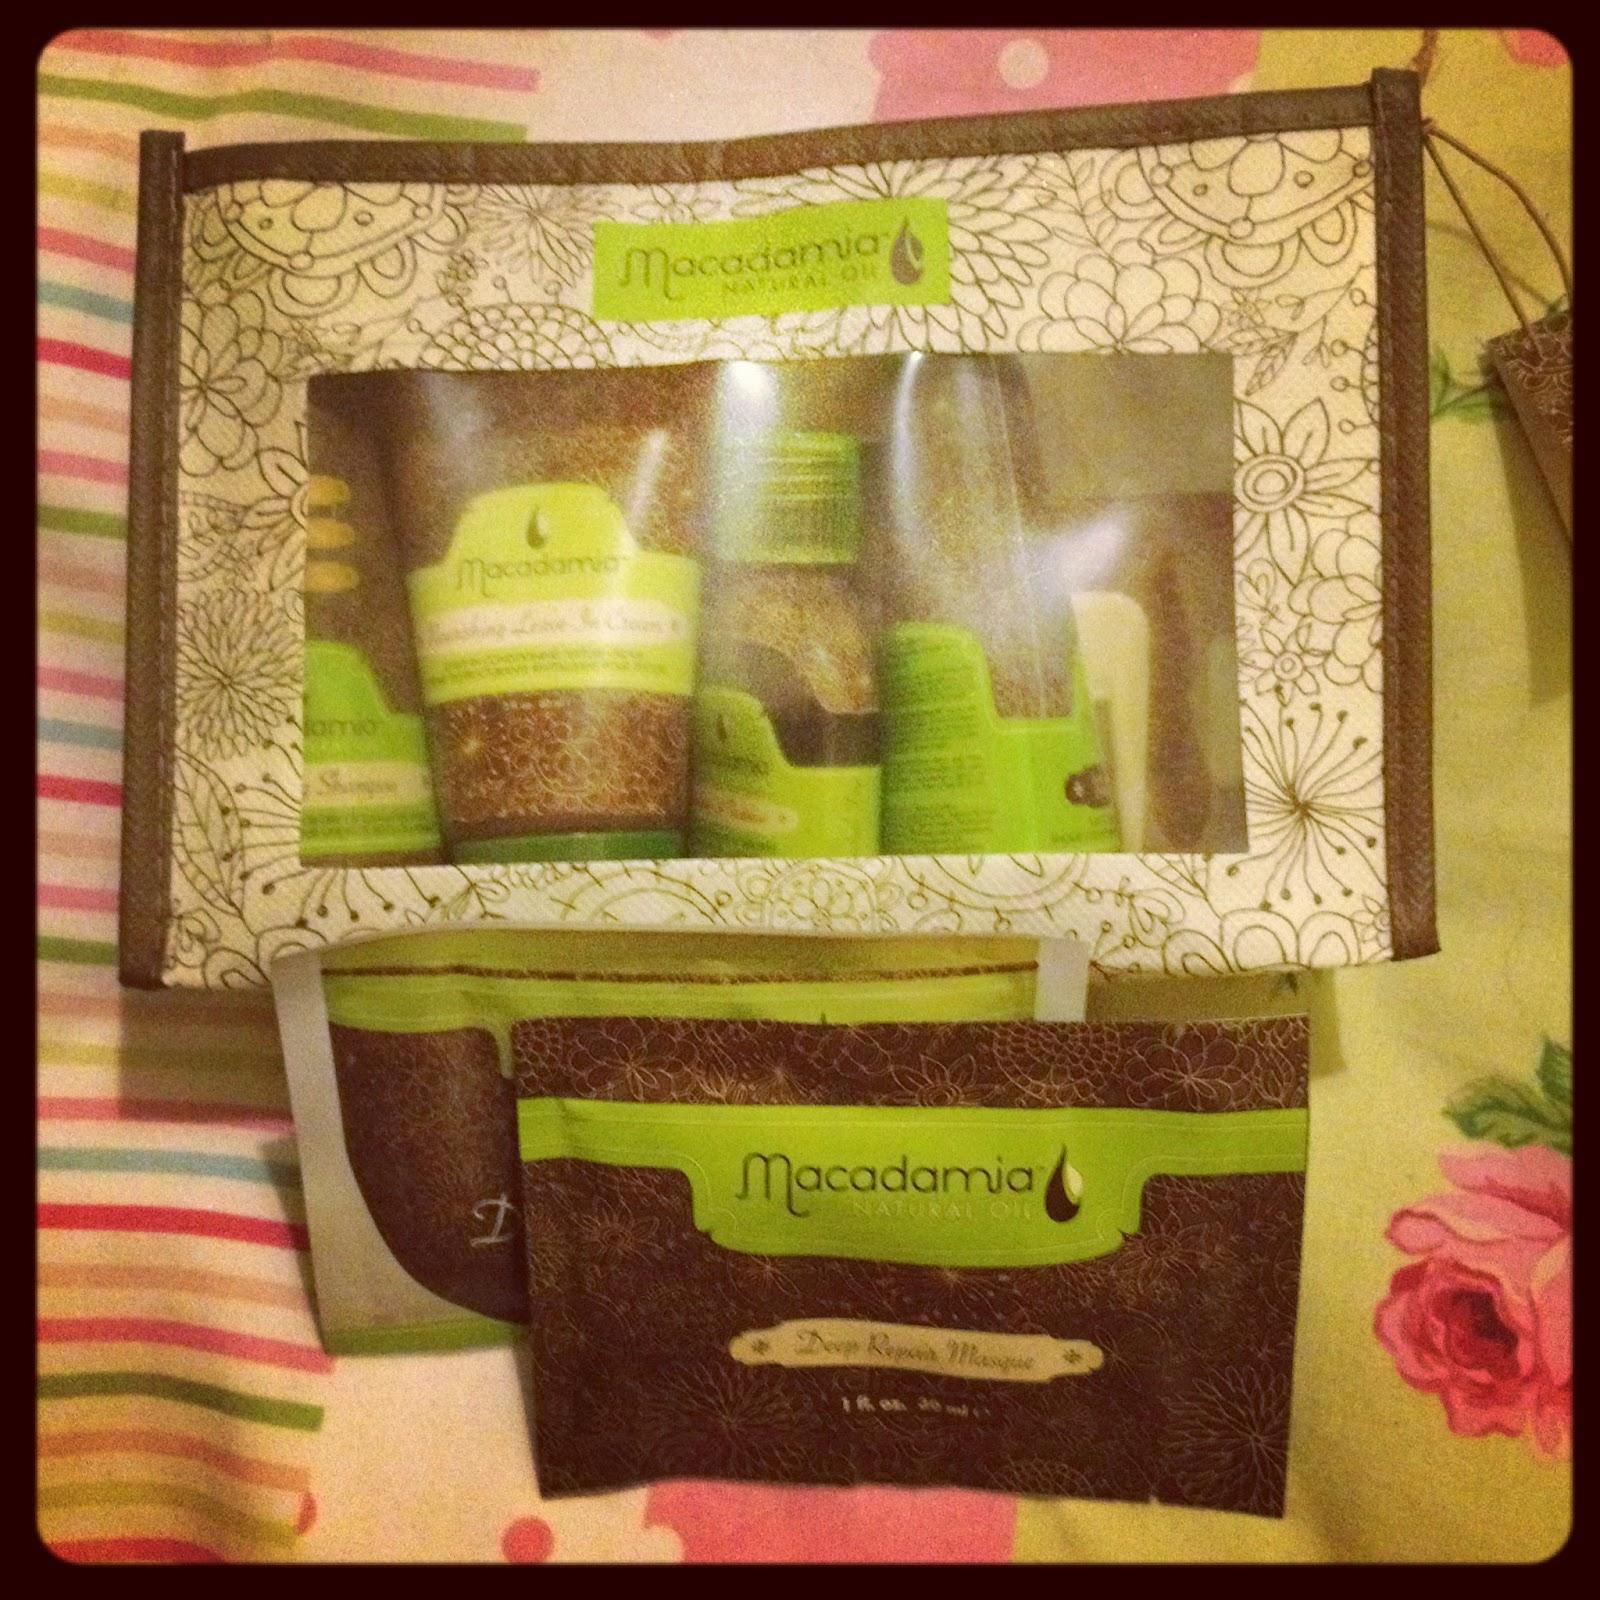 HAIR | Macadamia Natural Oil Travel Set